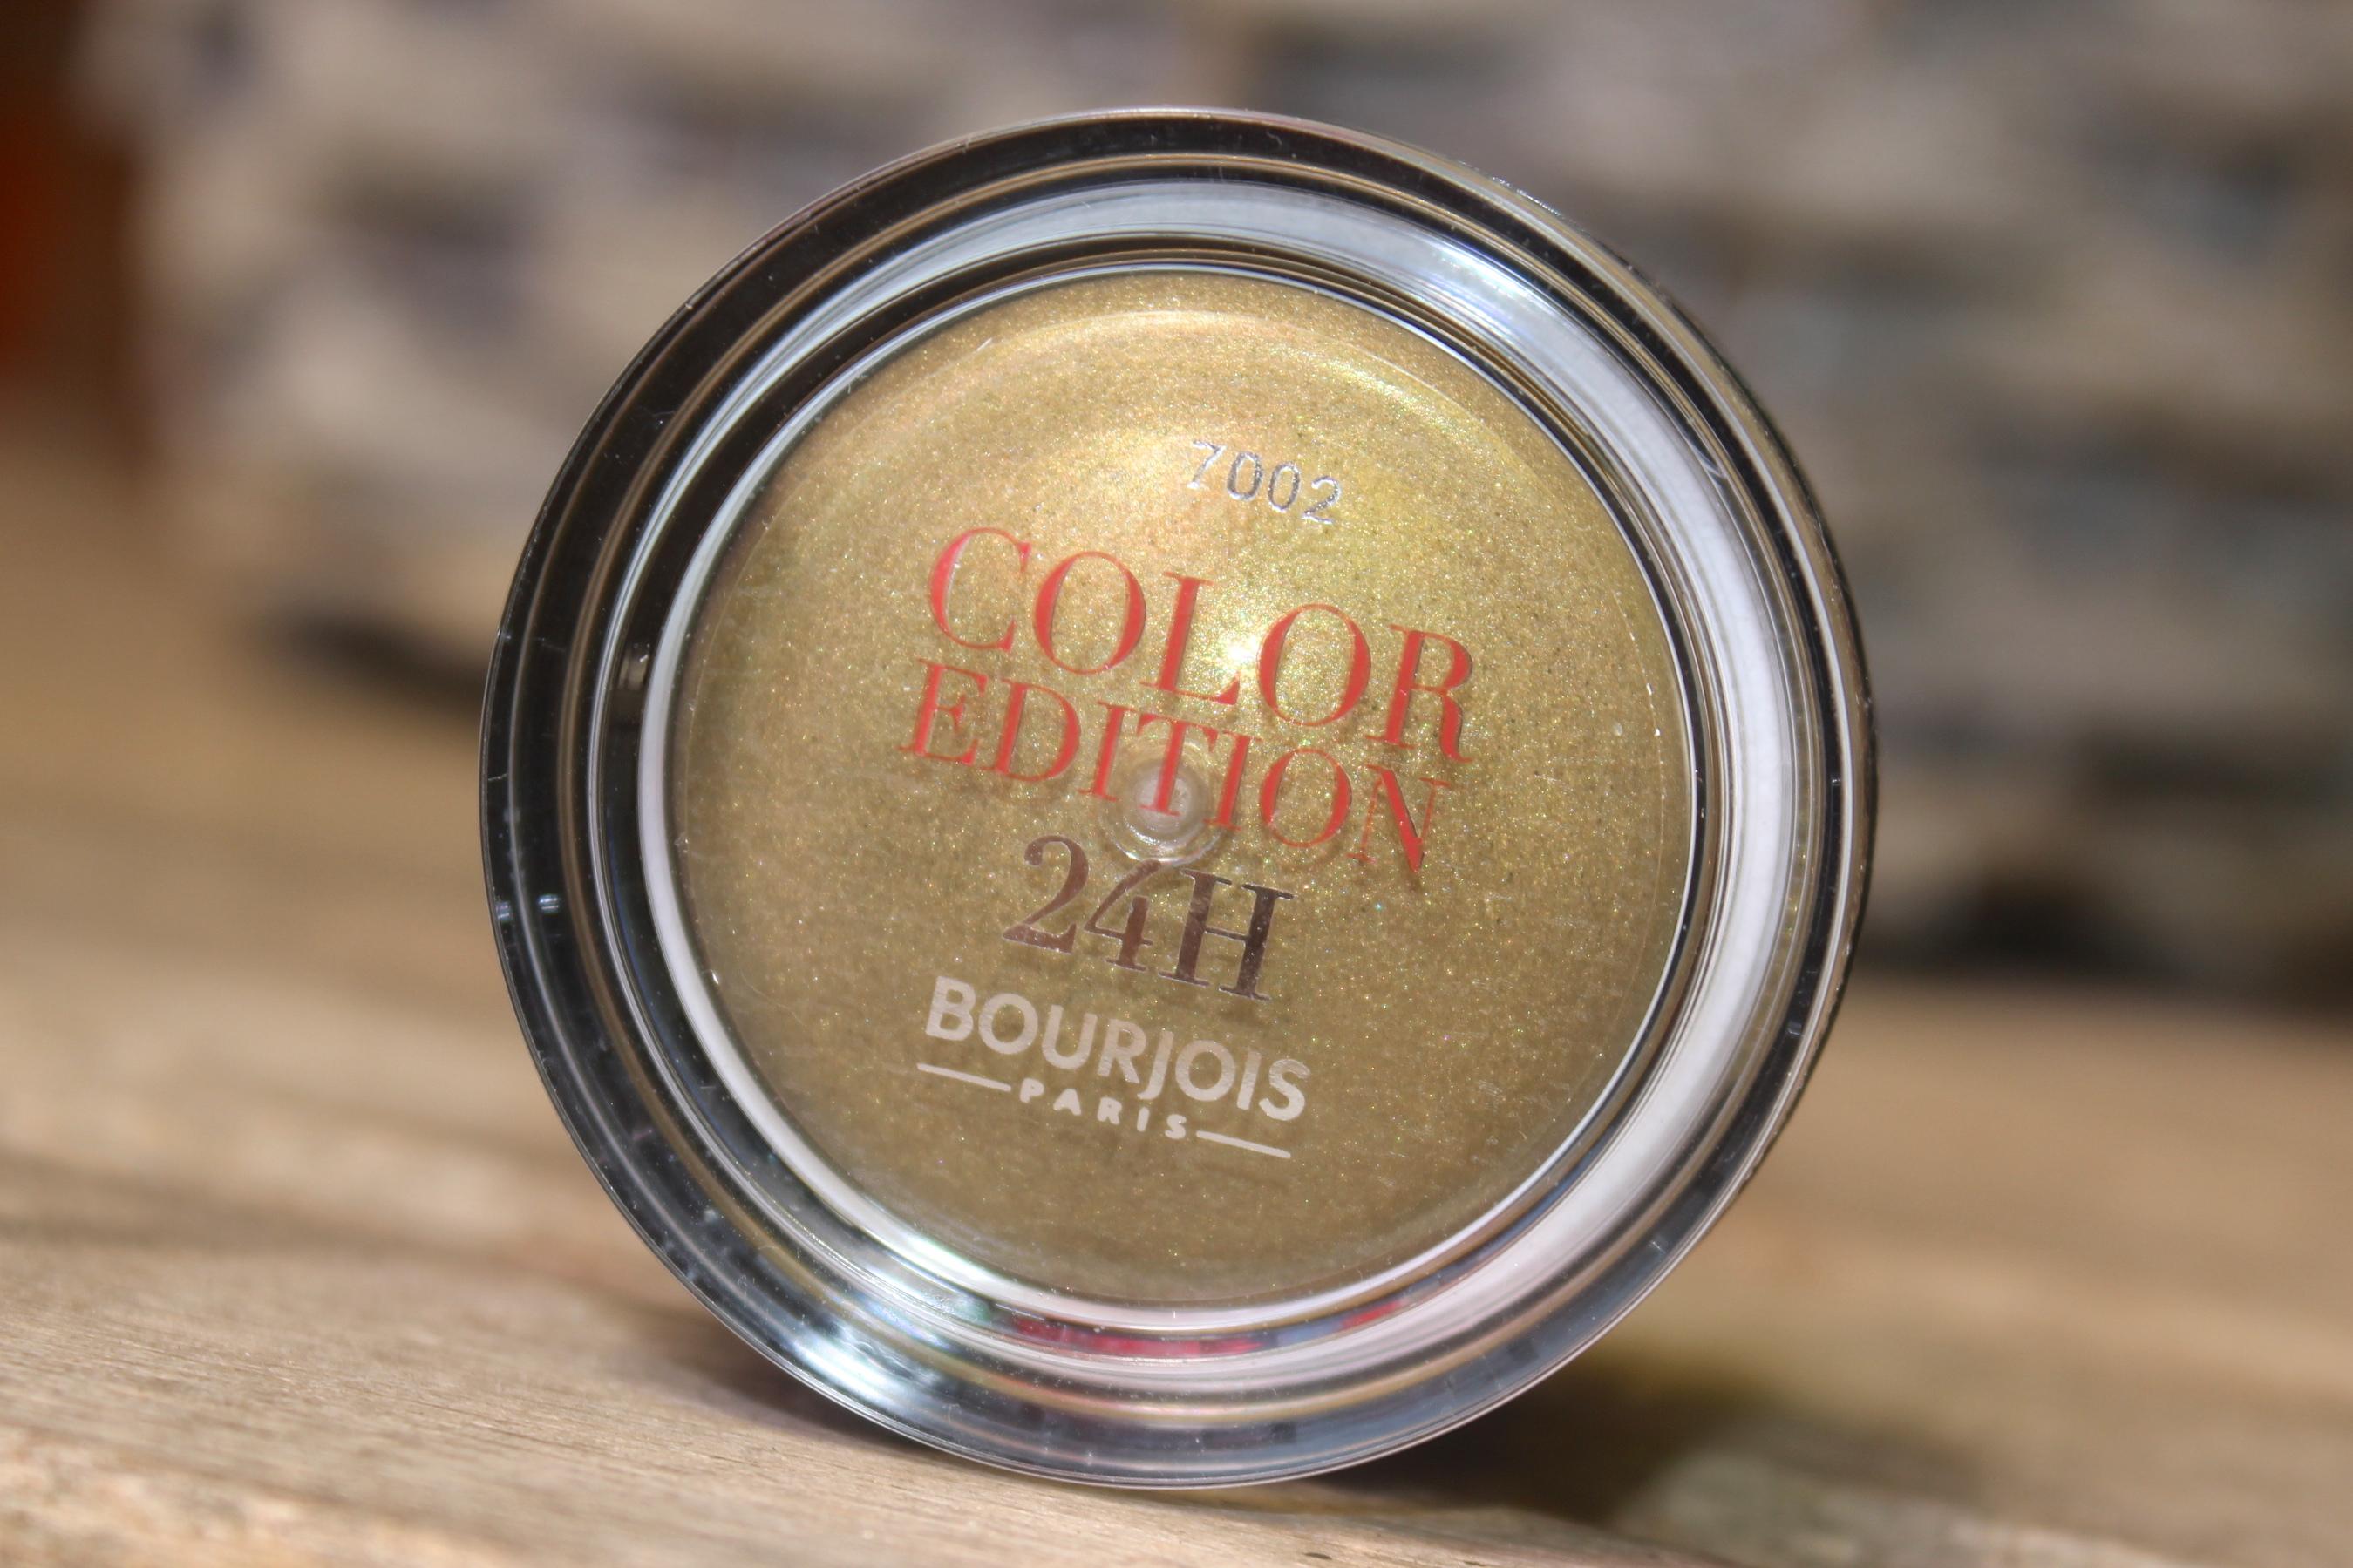 Bourjois Color edition 24h kaki cheri